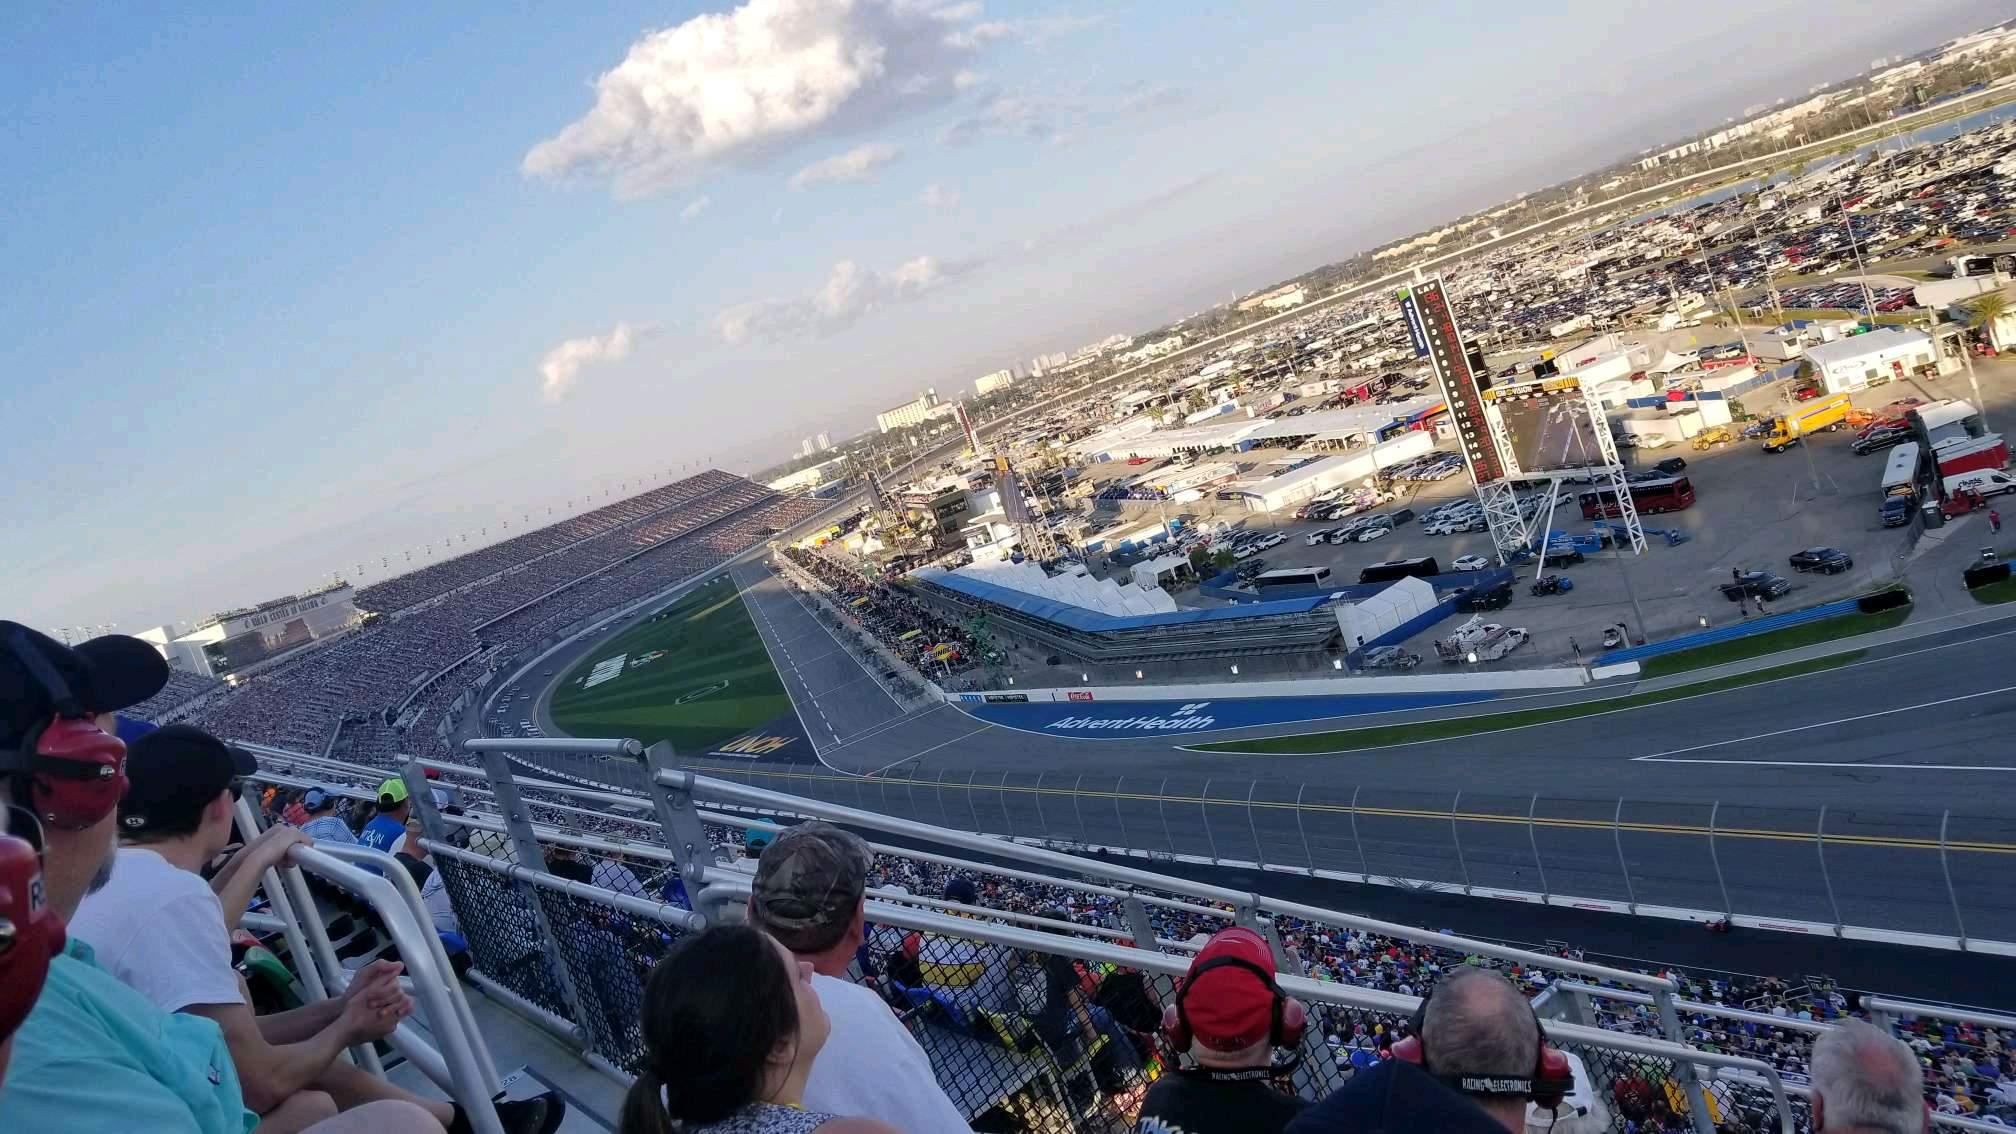 Daytona International Speedway Secção 489 Fila 29 Lugar 12